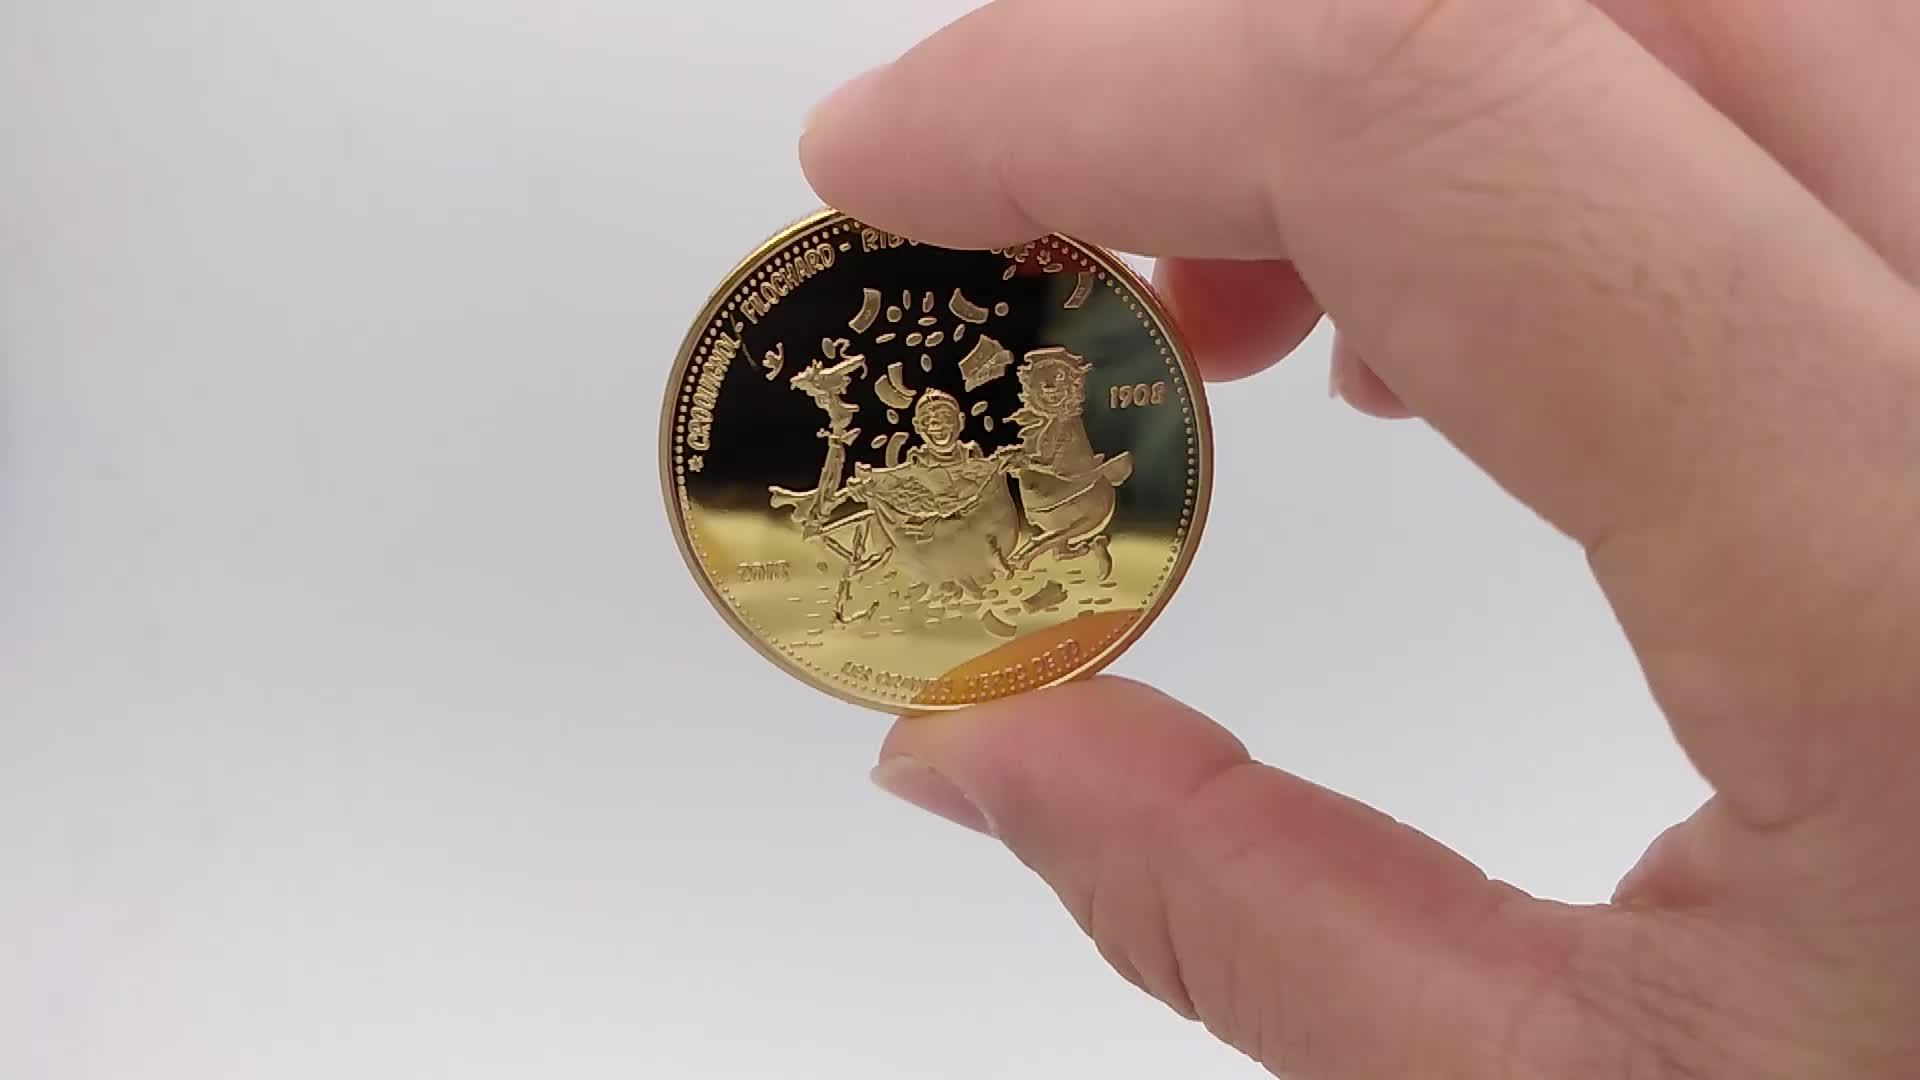 3D Metal gold silver Souvenir Marine Corps Coin